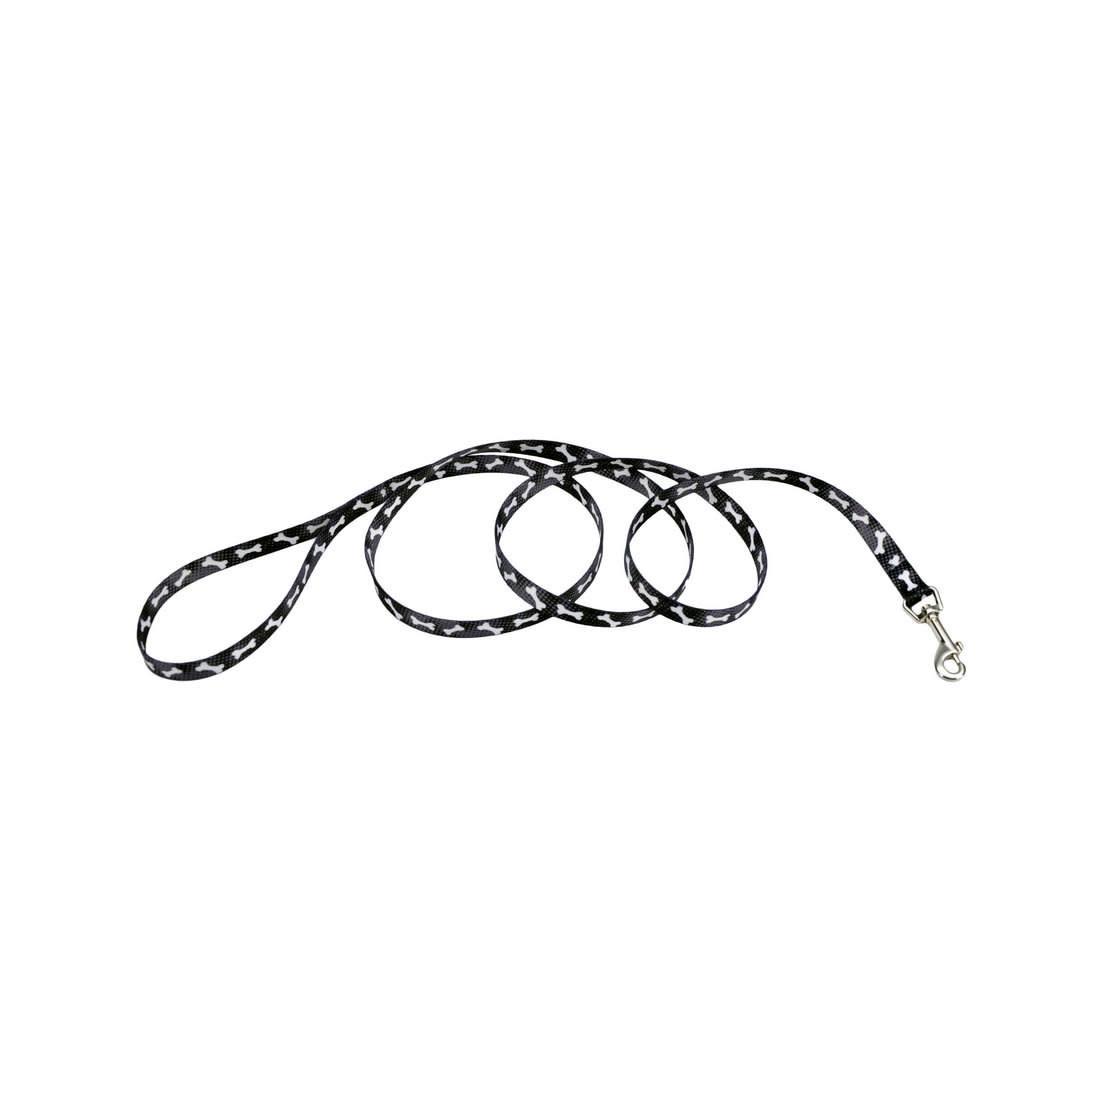 Styles Dog Leash, Black Bones Image